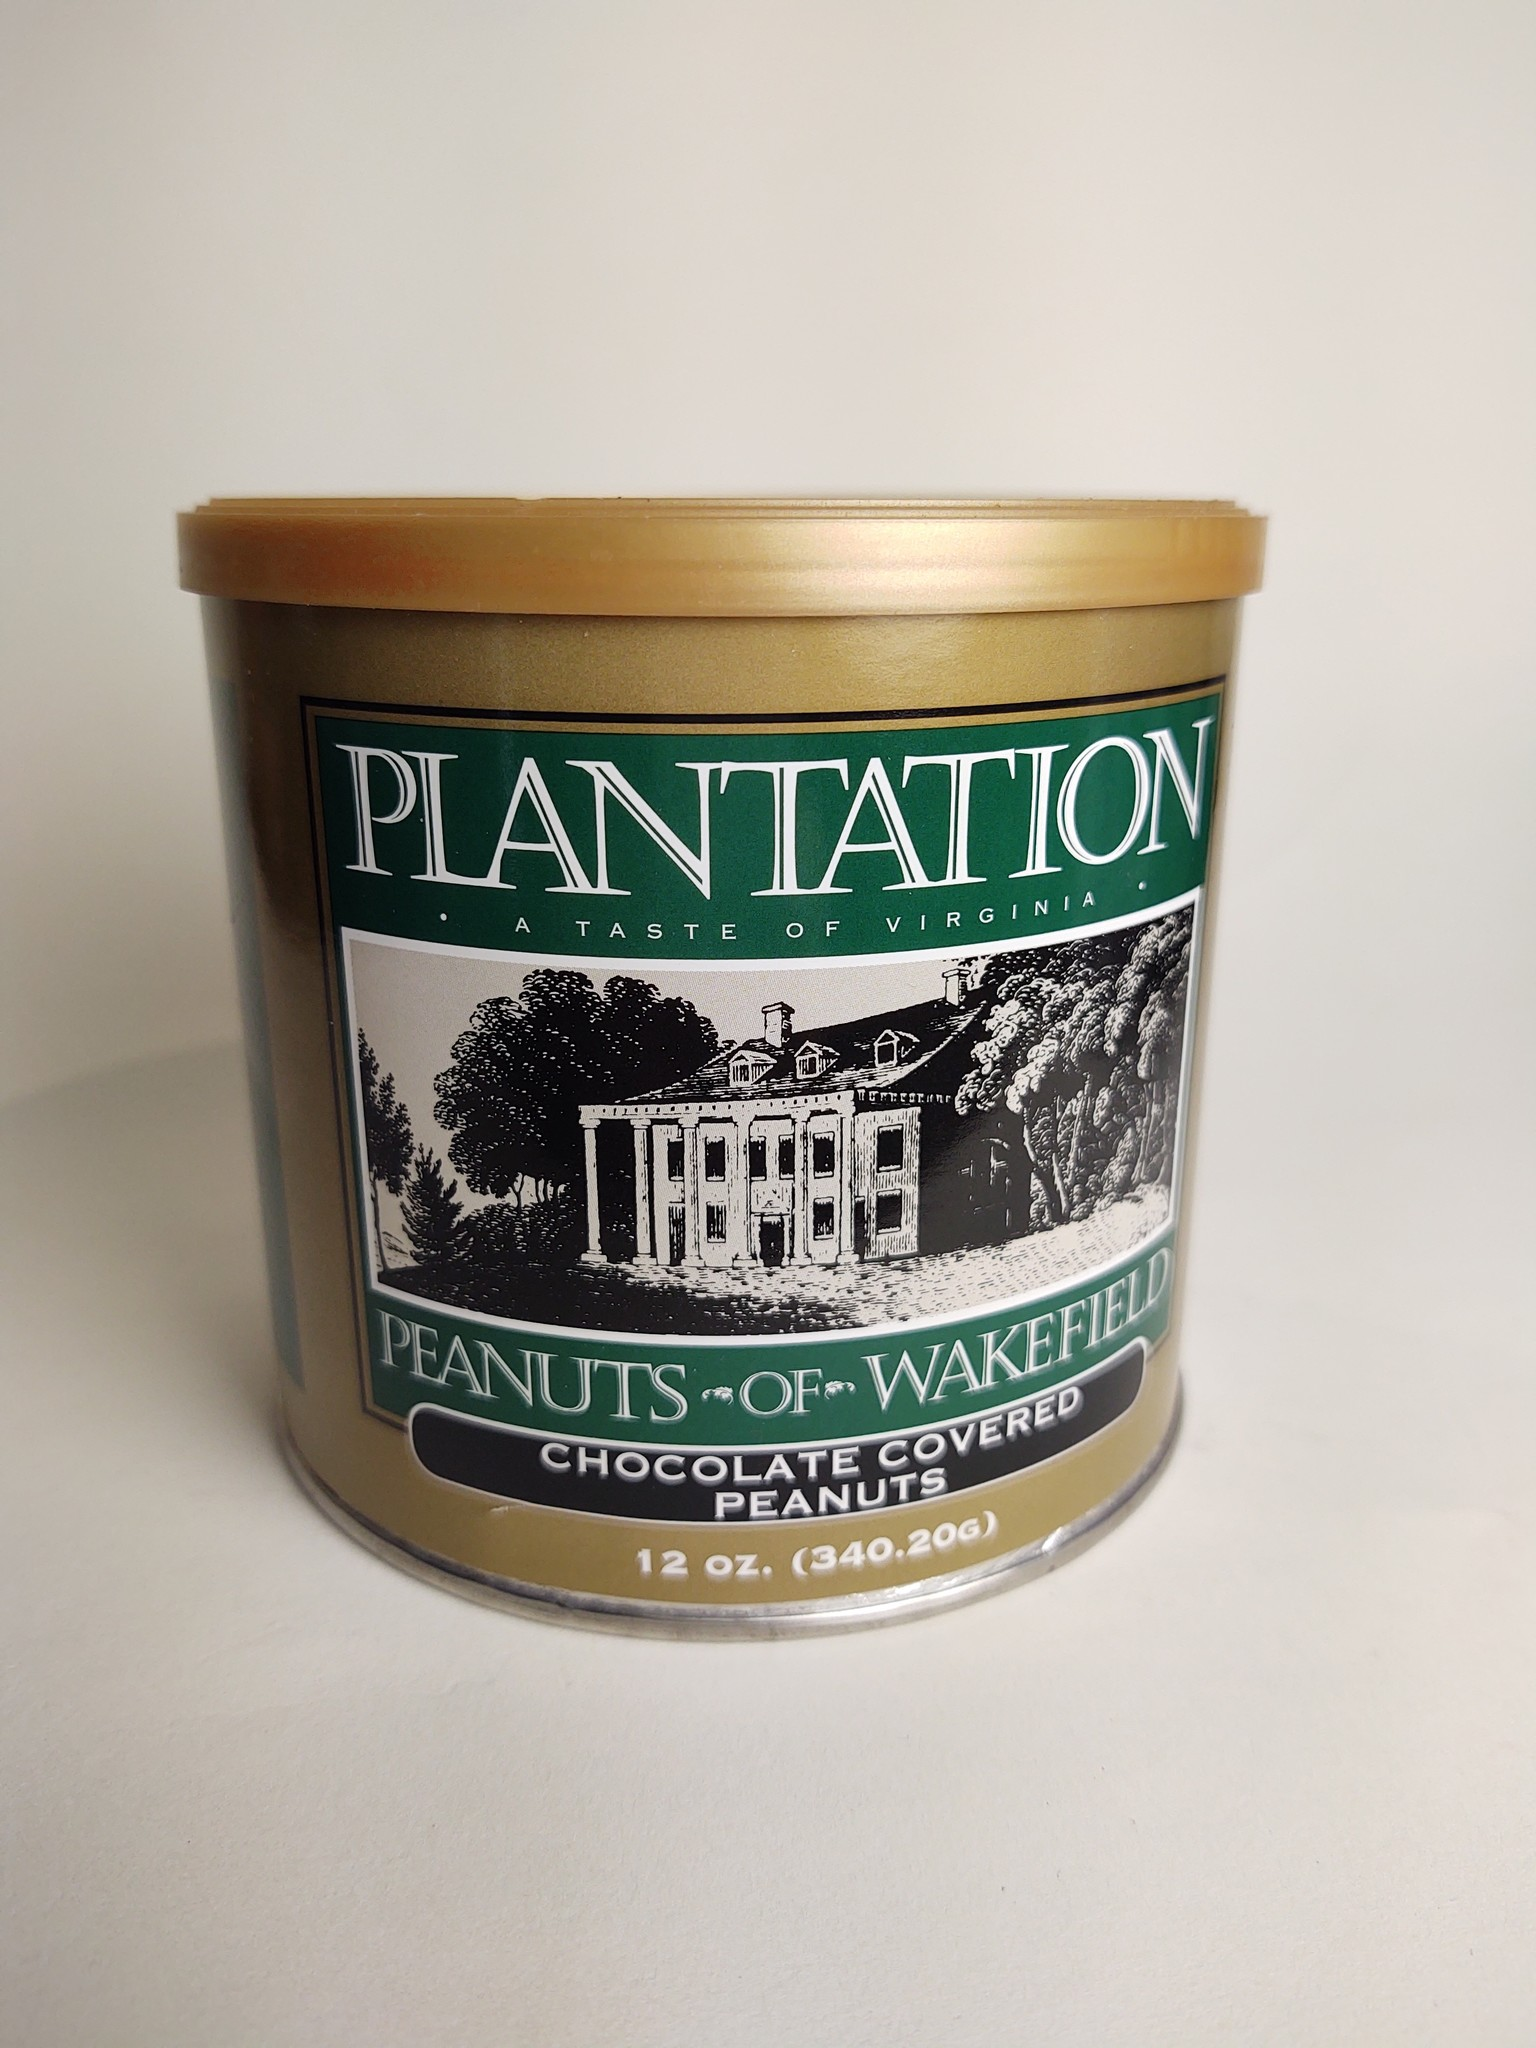 Plantation Peanuts of Wakefield Plantation Peanuts 12 oz. Dark Chocolate Peanuts